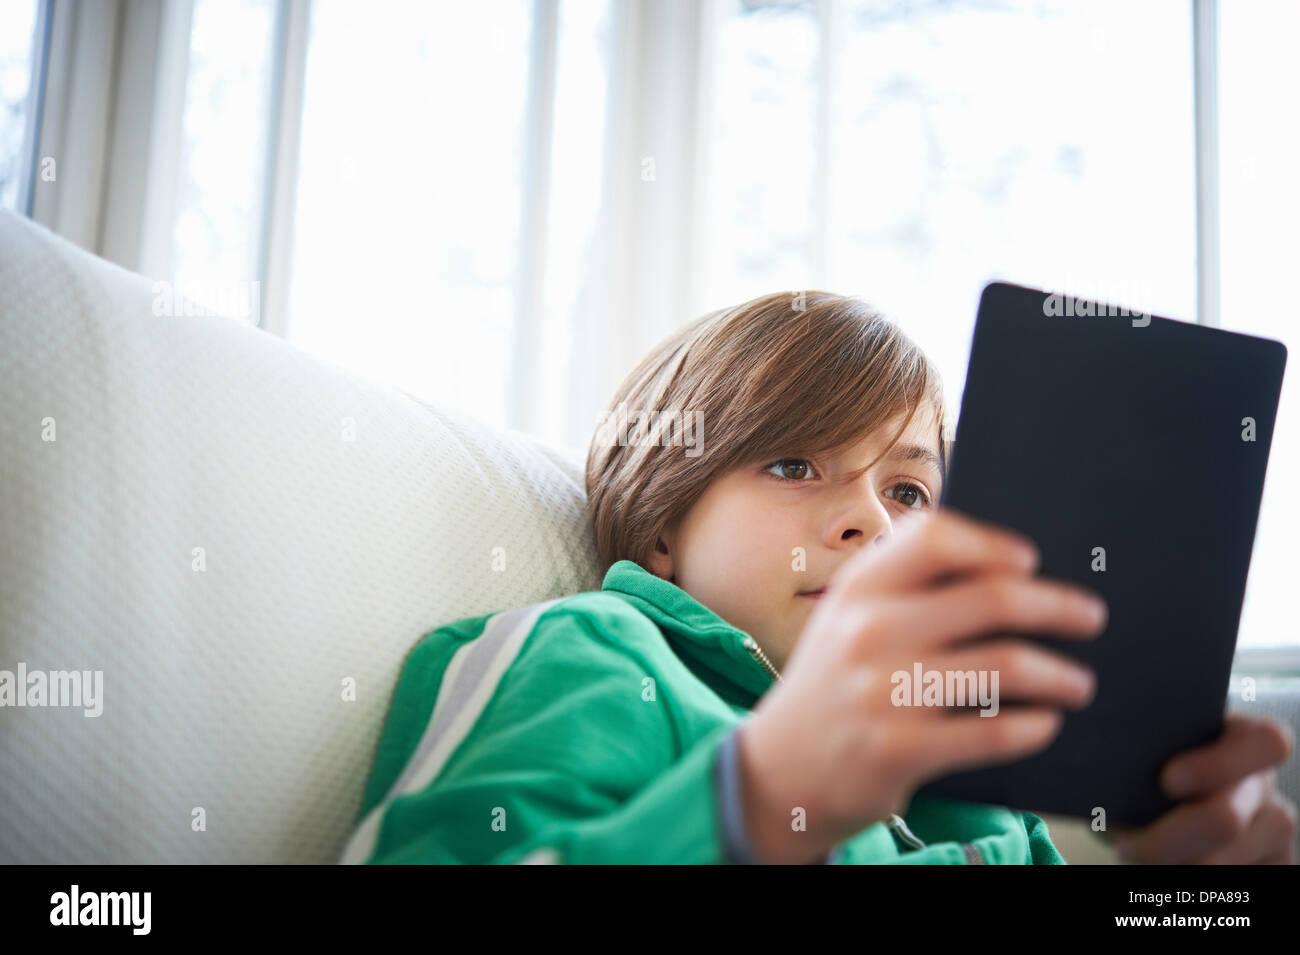 Junge auf Sofa mit digital-Tablette Stockfoto